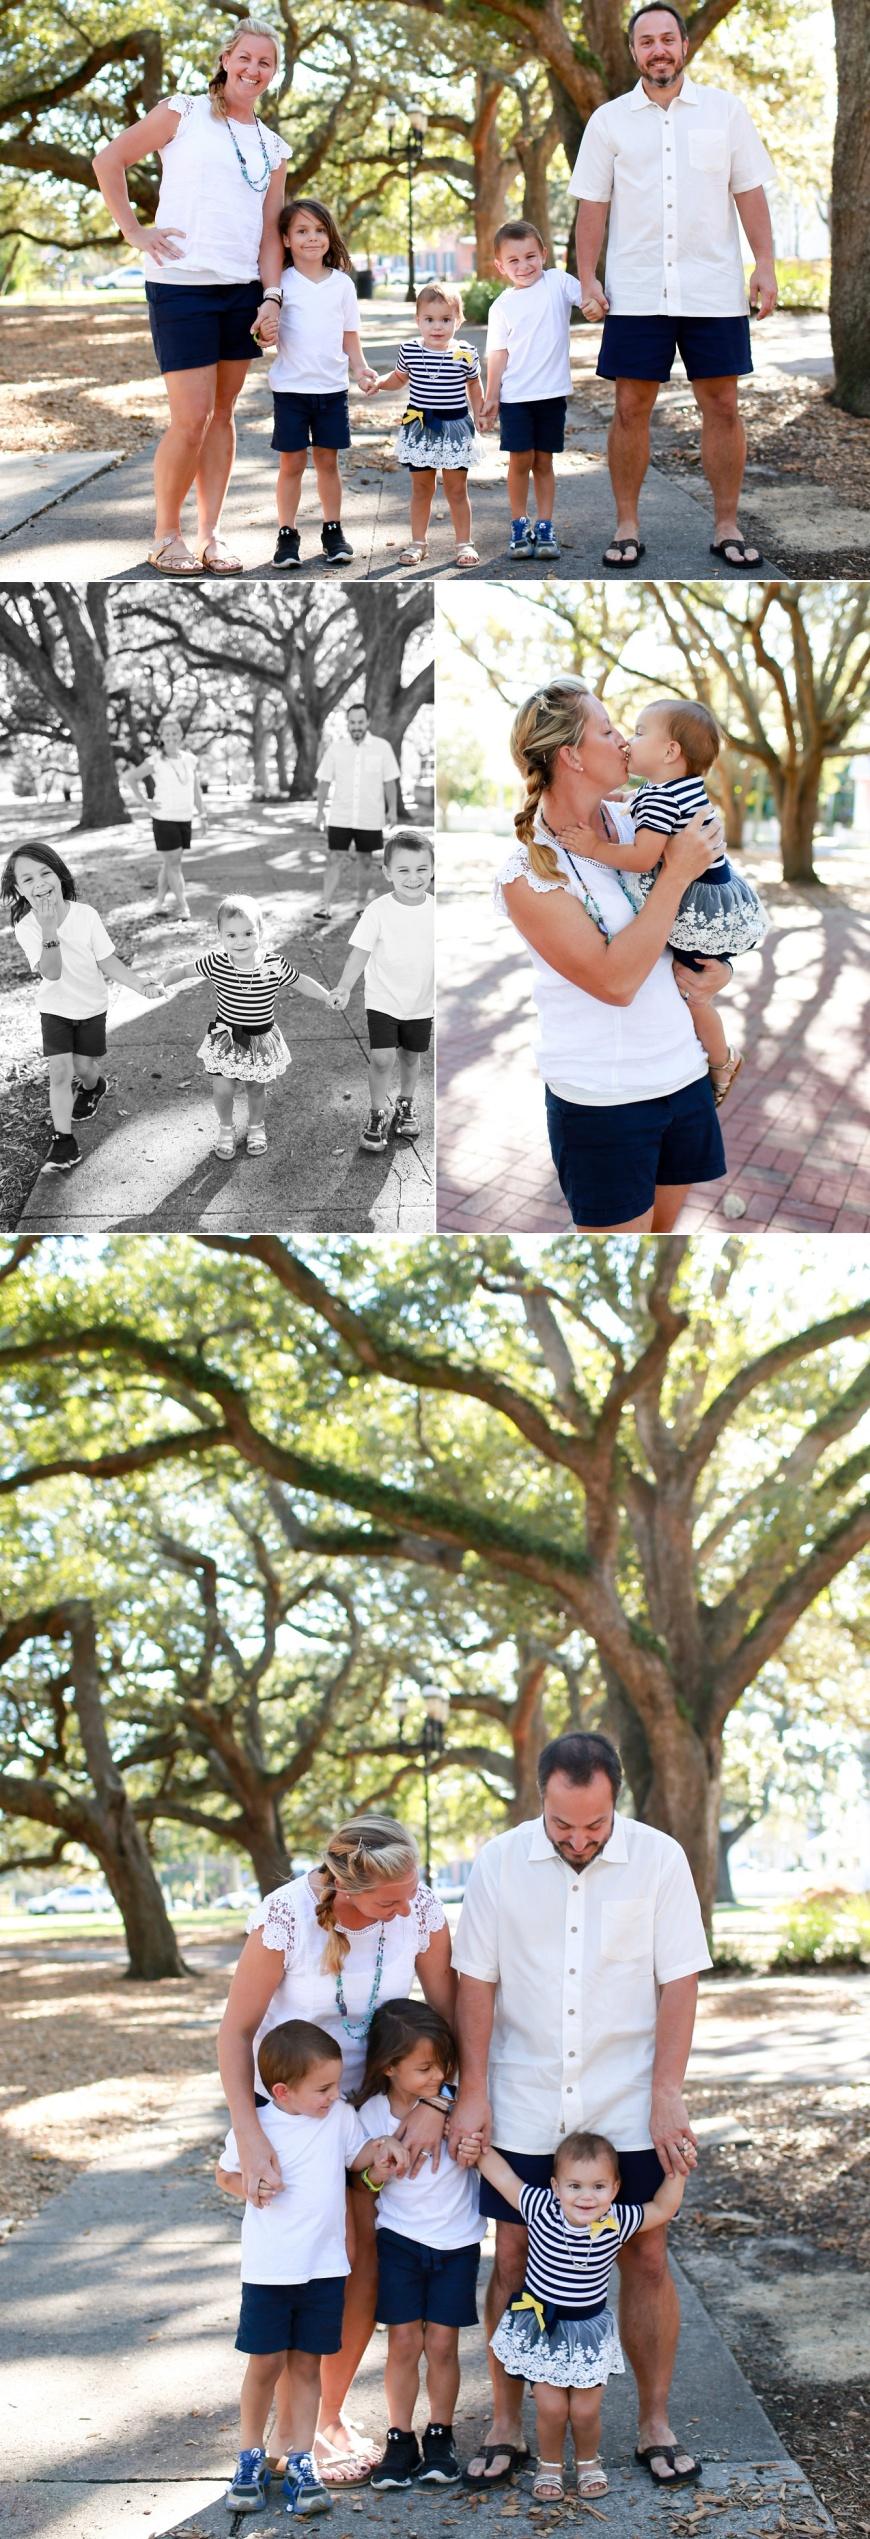 Seville-Square-Pensacola-Florida-Family-Photographer_1000.jpg